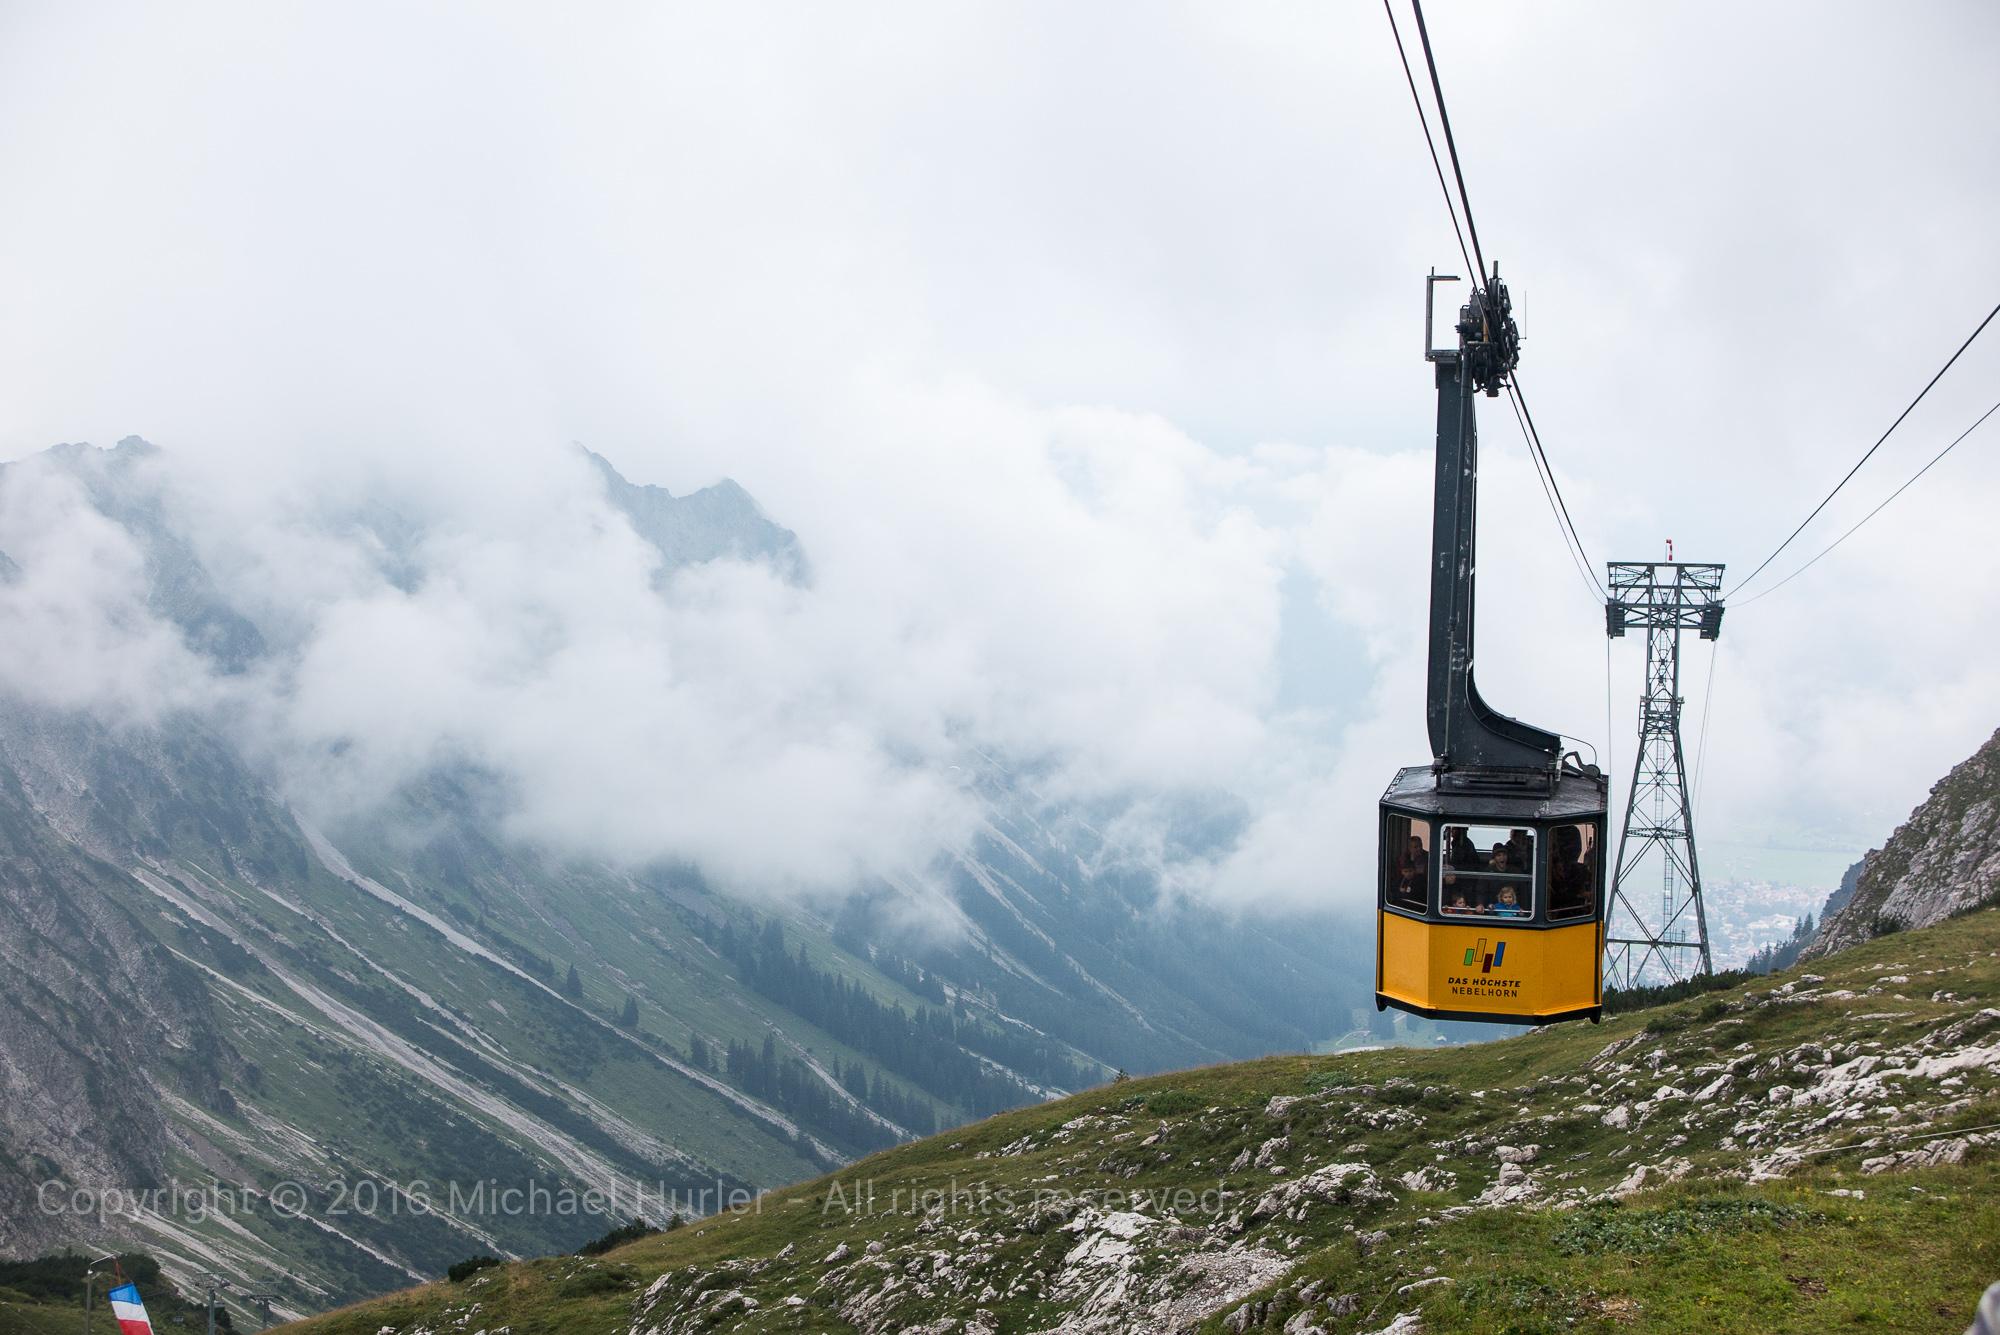 20.08.2015, Oberstdorfurlaub, Auf dem Nebelhorn